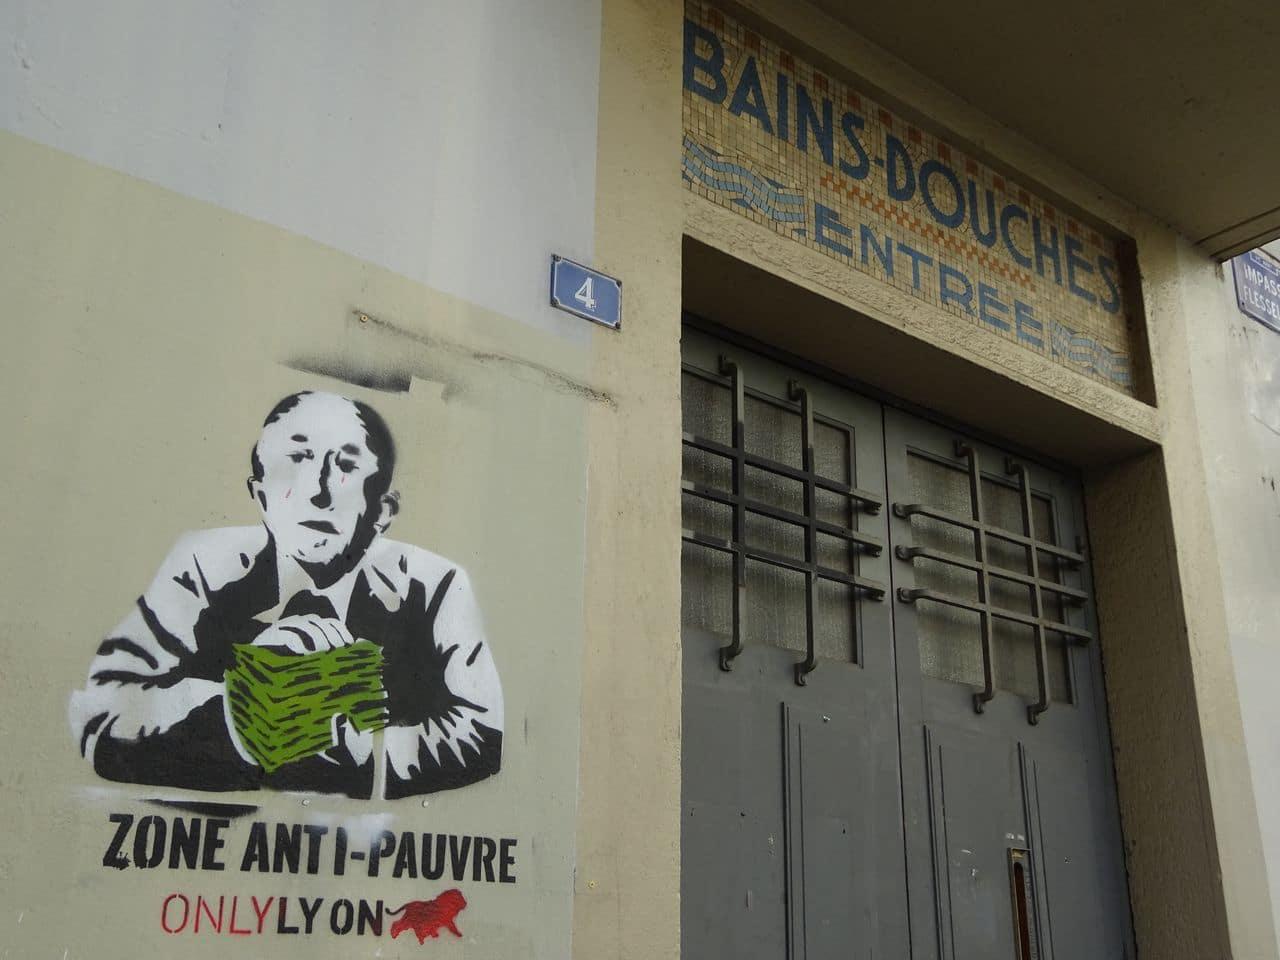 zone antipauvre street art lyon